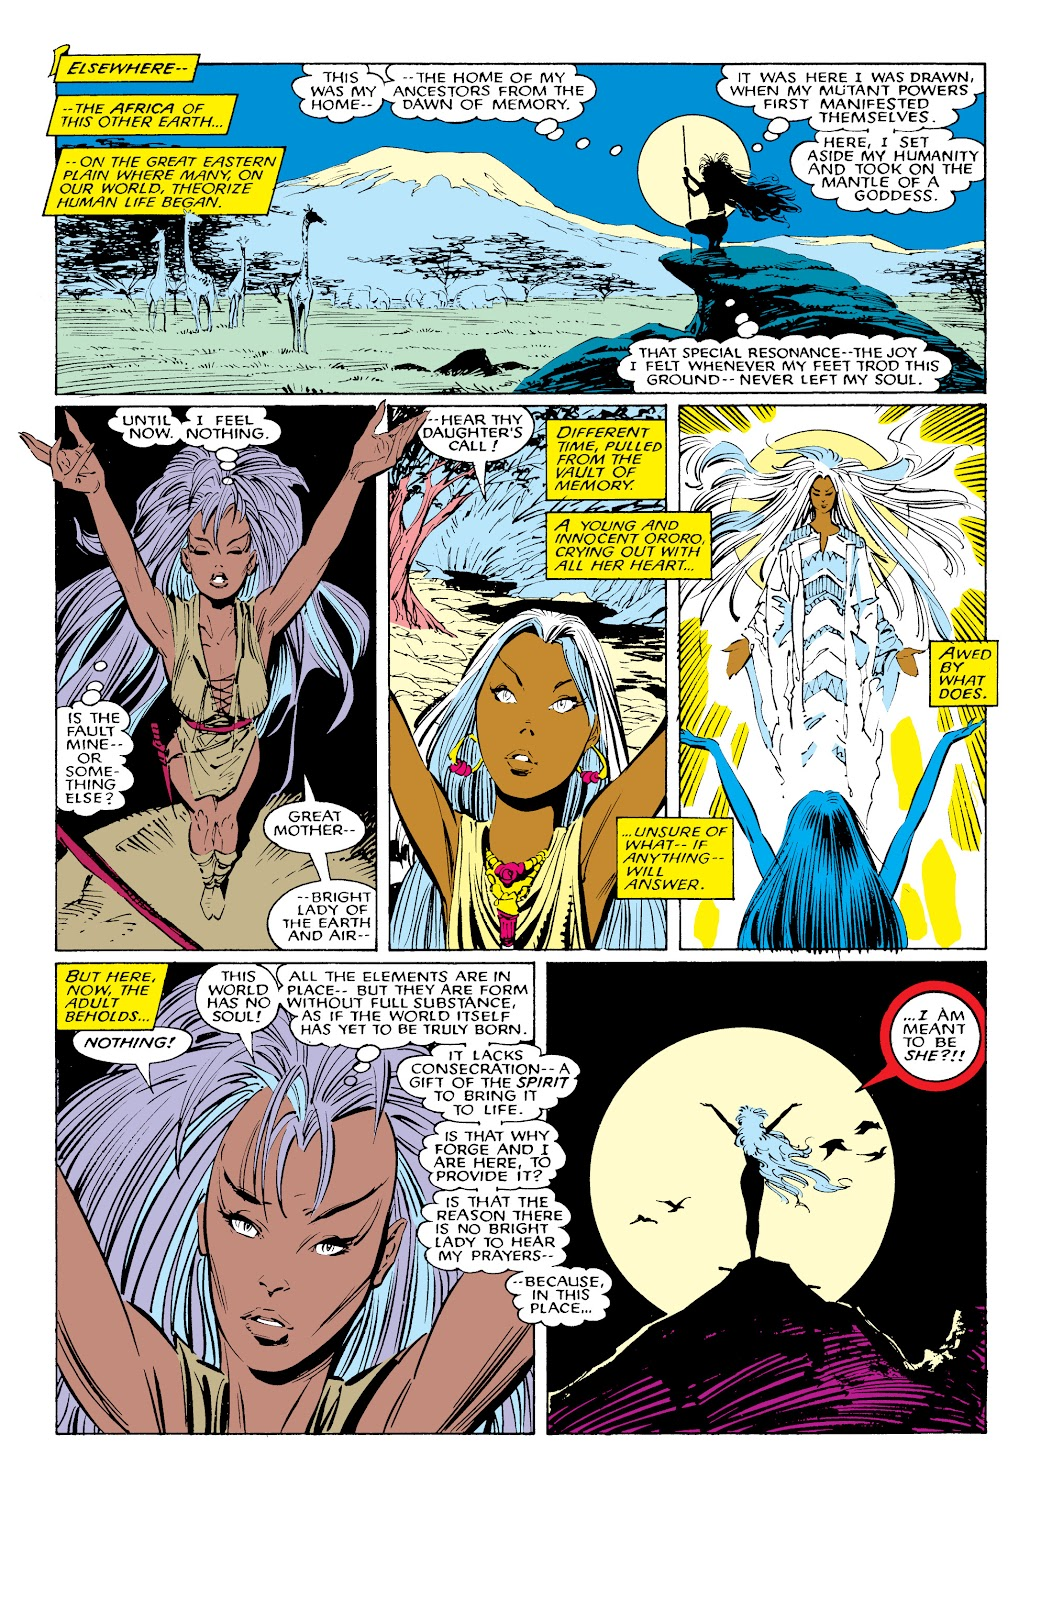 Read online X-Men Milestones: Fall of the Mutants comic -  Issue # TPB (Part 1) - 48